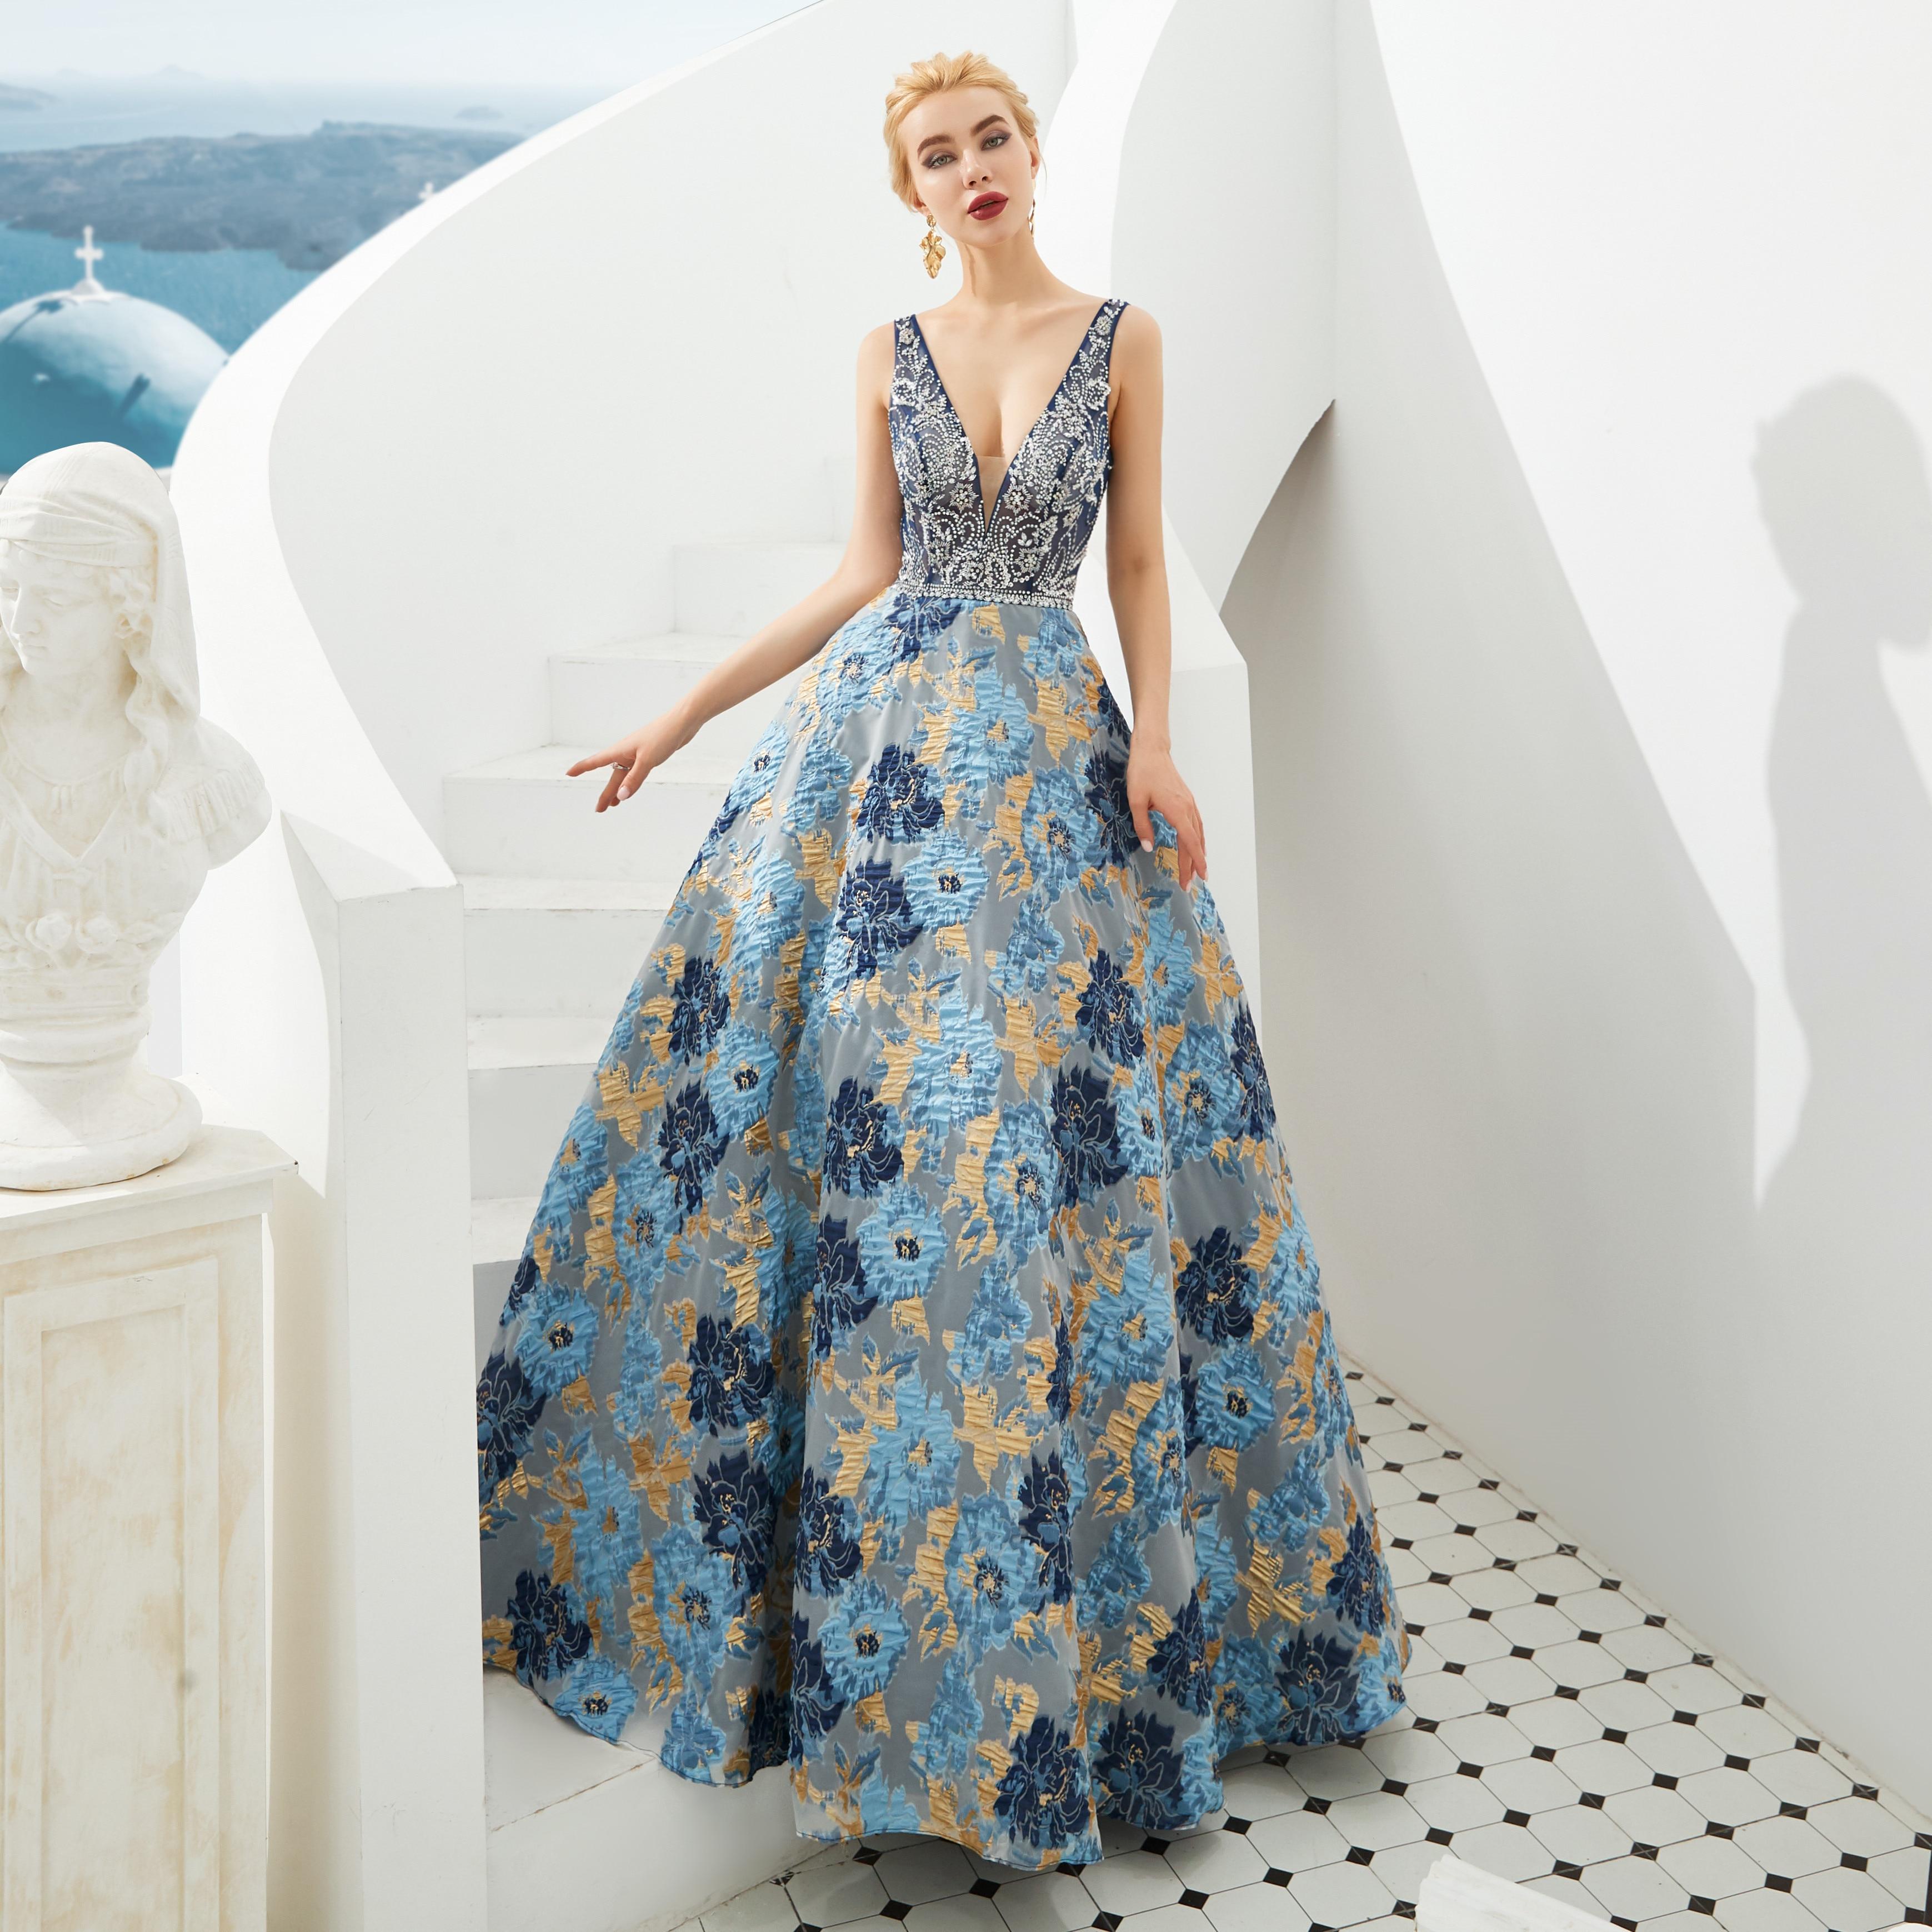 2019 col en V robes de bal Floral imprimé robes de soirée robe formelle robe Avondjurken Gala Jurken